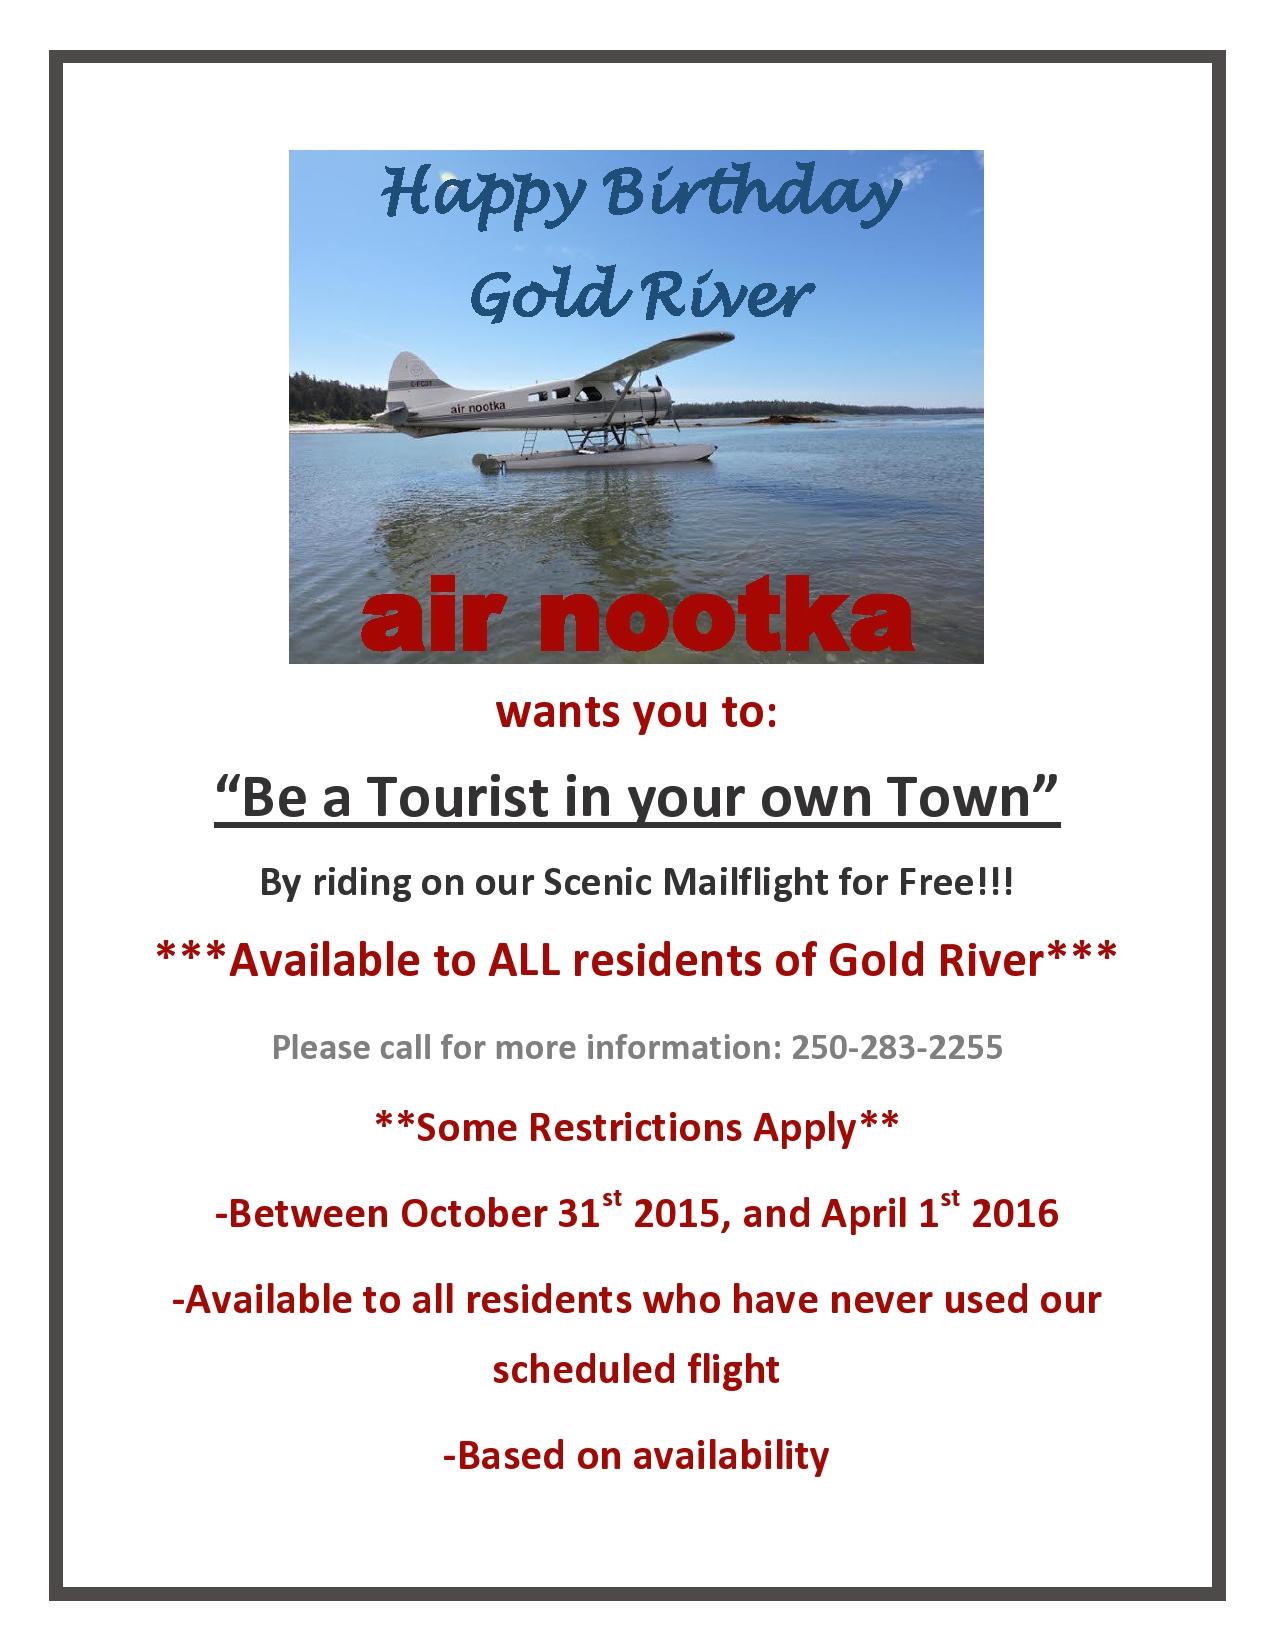 Happy Birthday Gold River!